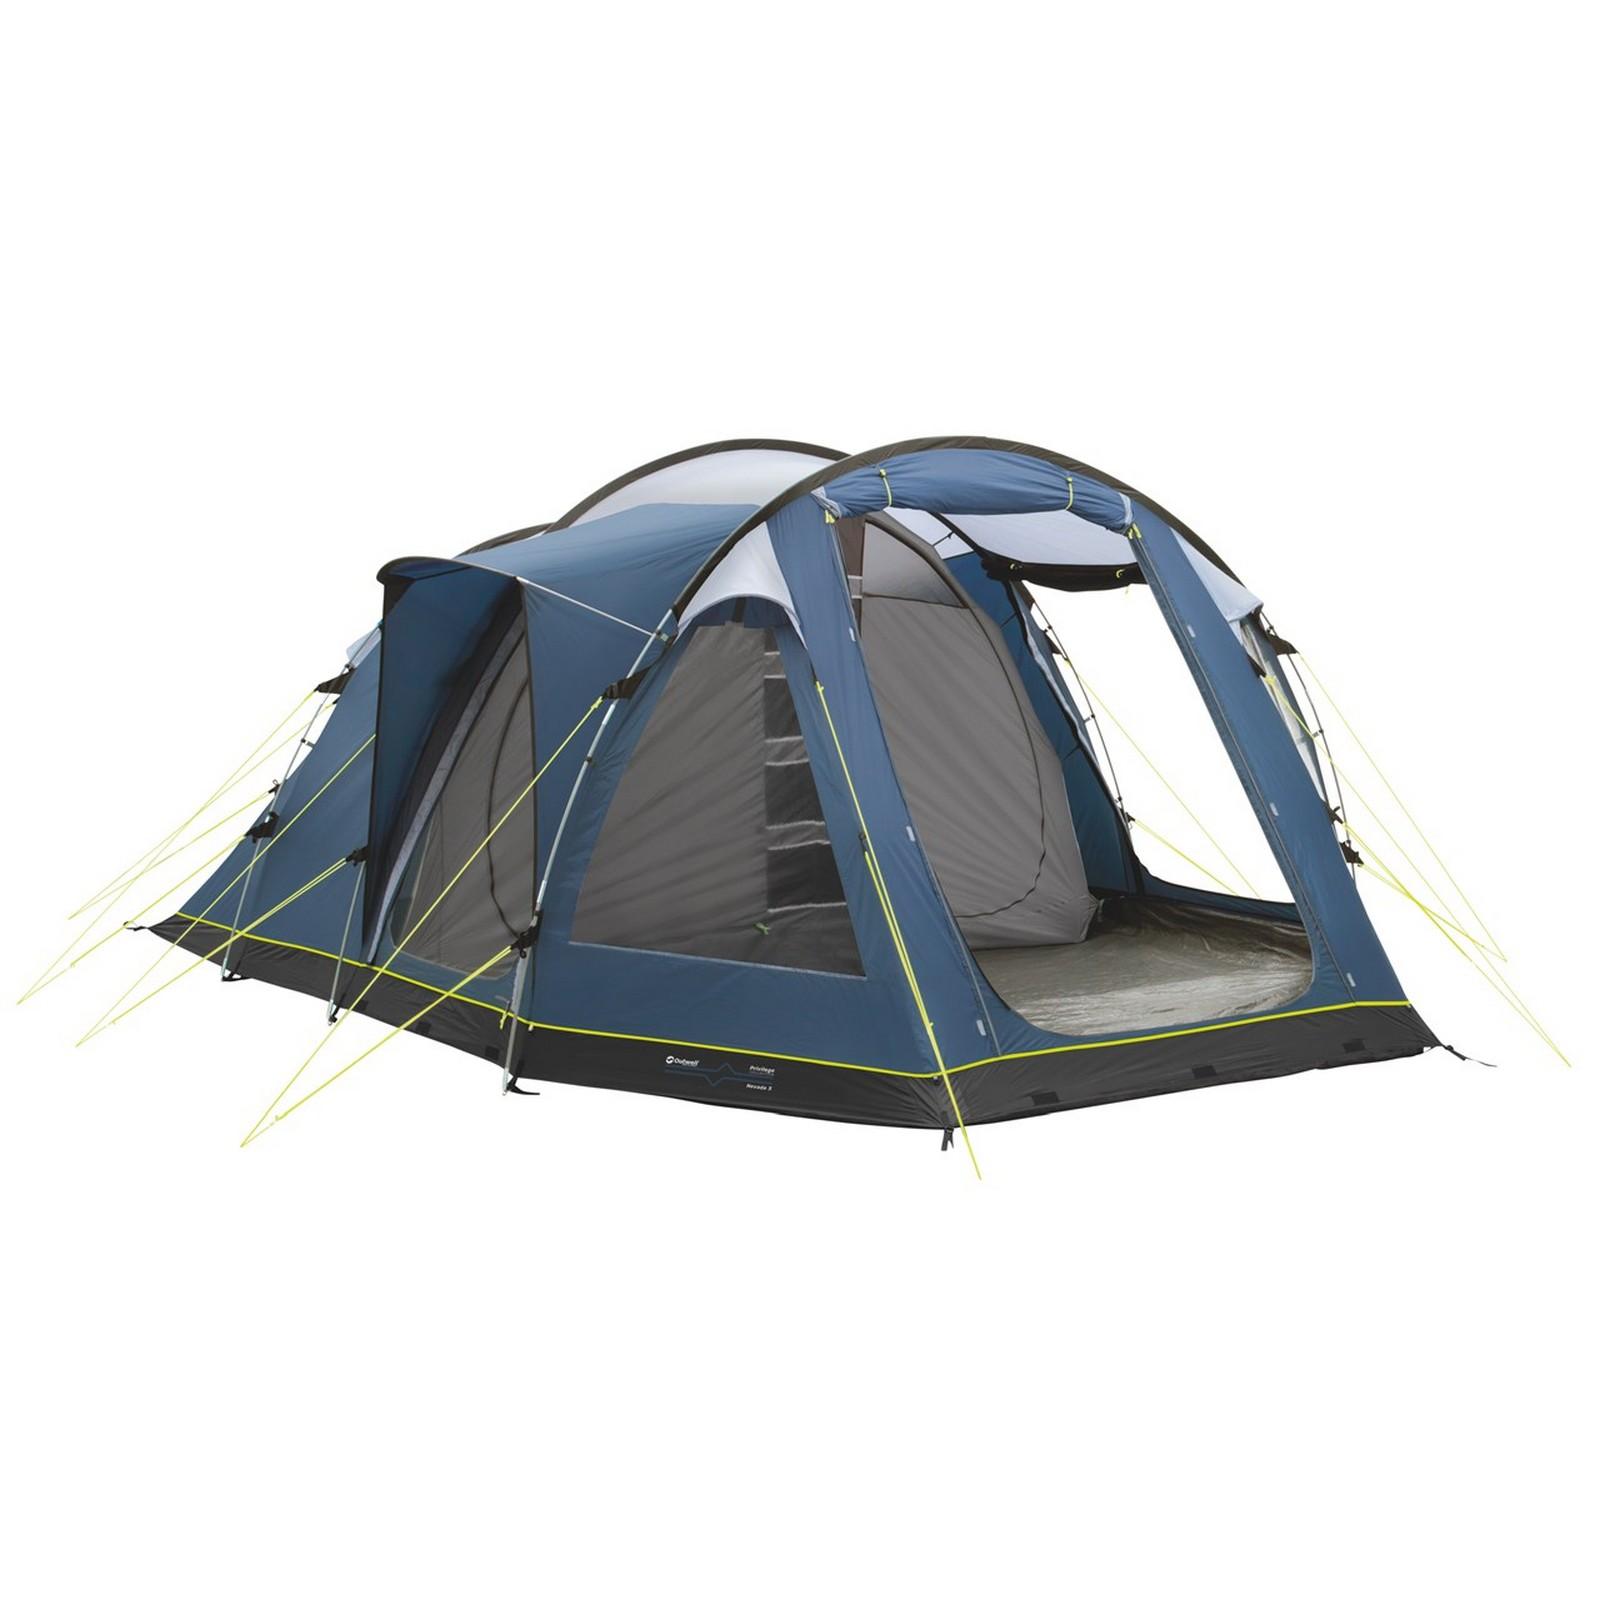 Zelt Discovery 5 : Zelt familienzelt campingzelt großraumzelt nevada für